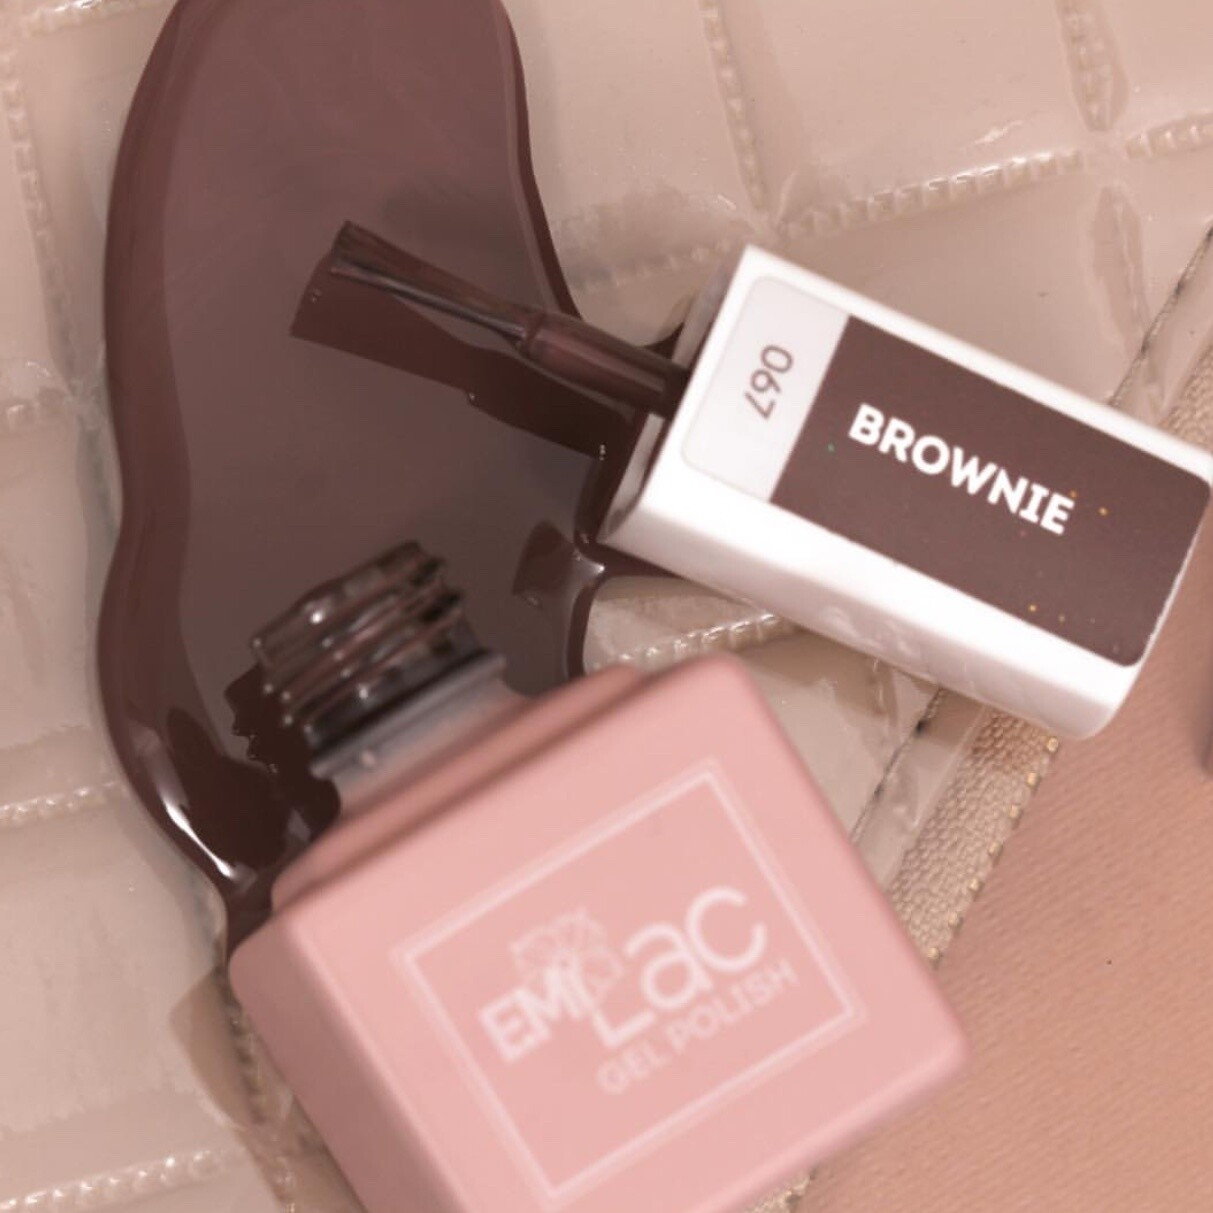 E.MiLac CE Brownie #067 9 ml.